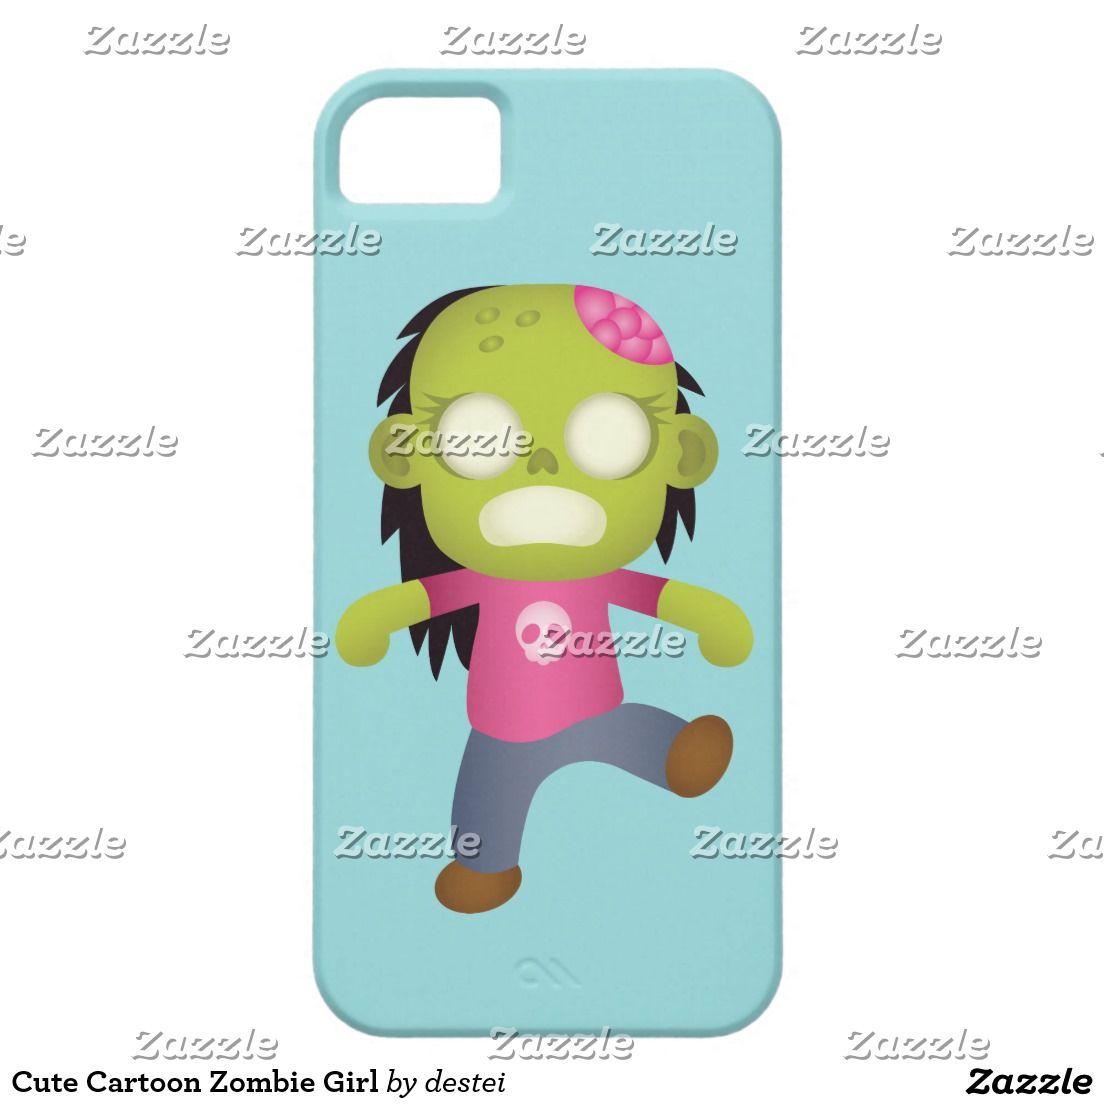 Cute Cartoon Zombie Girl